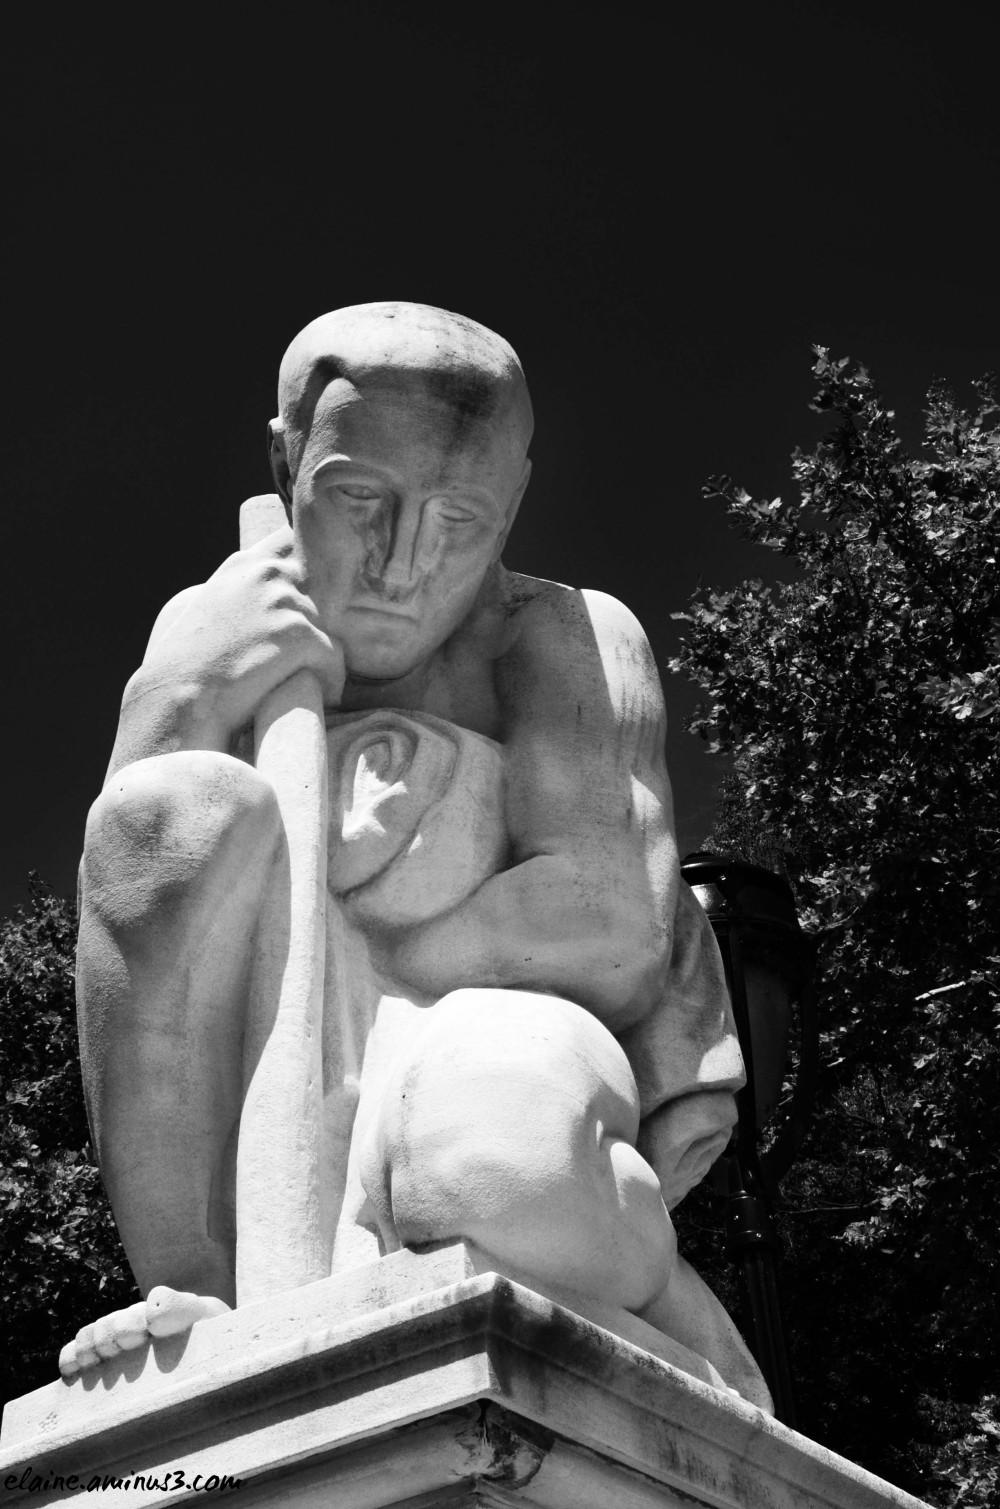 the immigrant sculpture